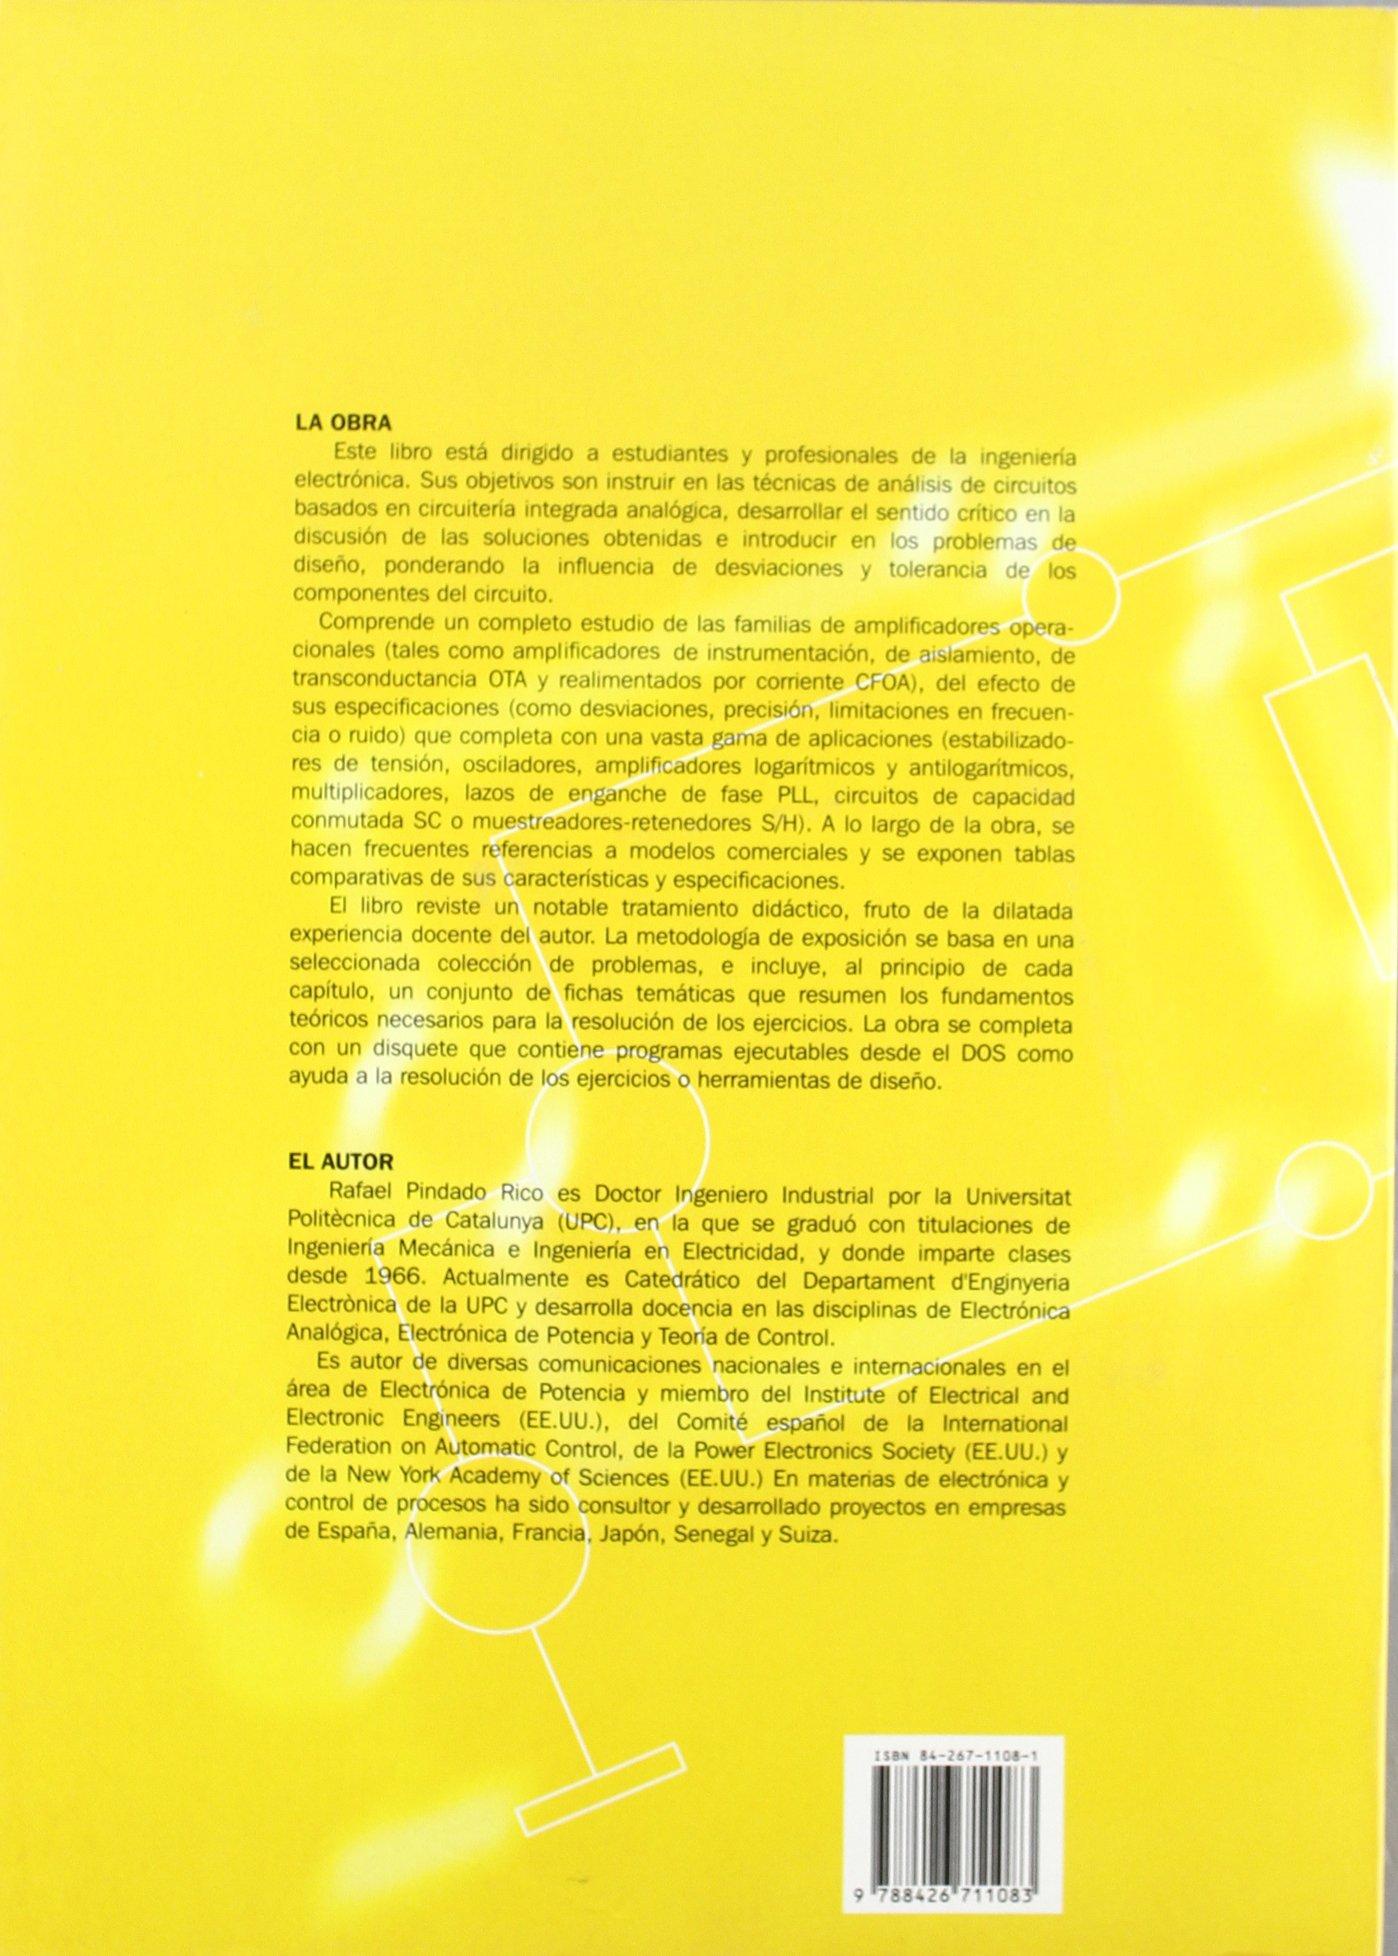 Electrónica Analógica Integrada (ACCESO RÁPIDO): Amazon.es: Rafael Pindado Rico: Libros